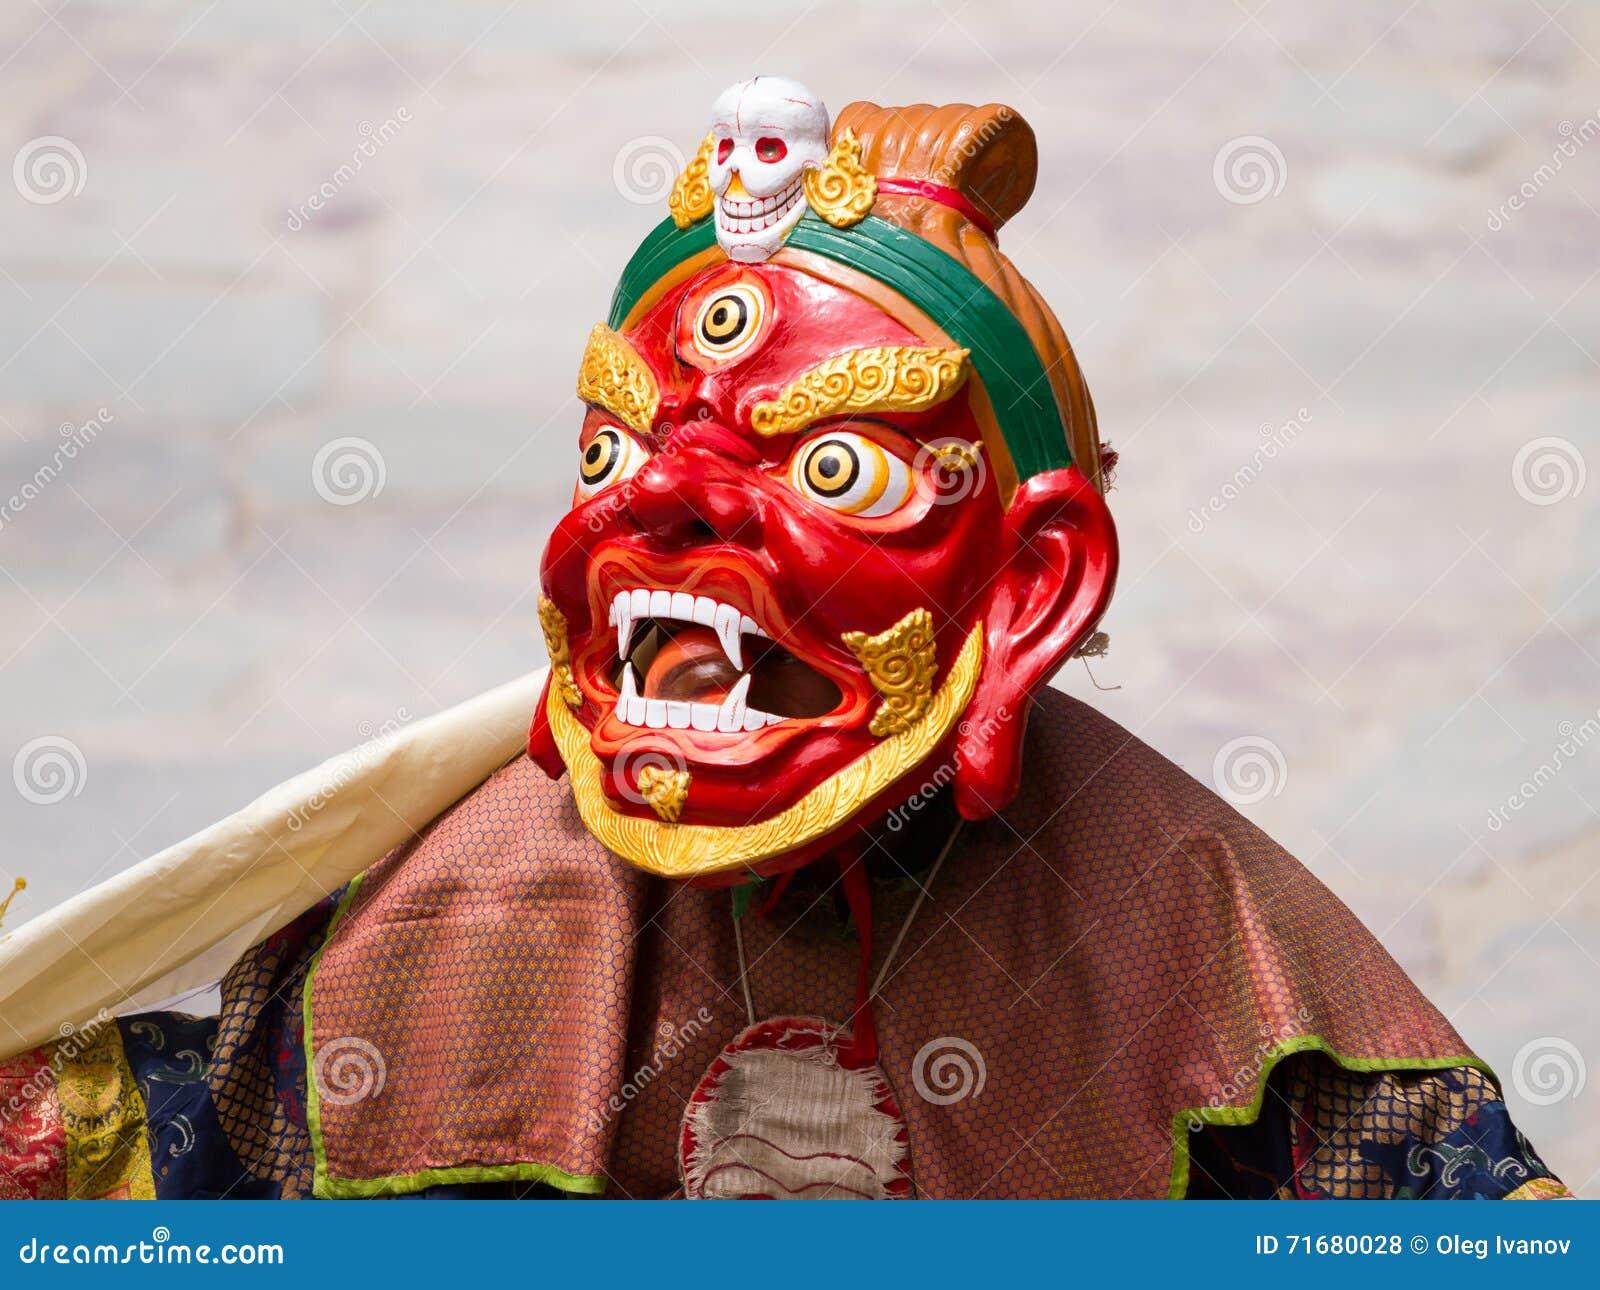 El monje no identificado realiza un m religioso